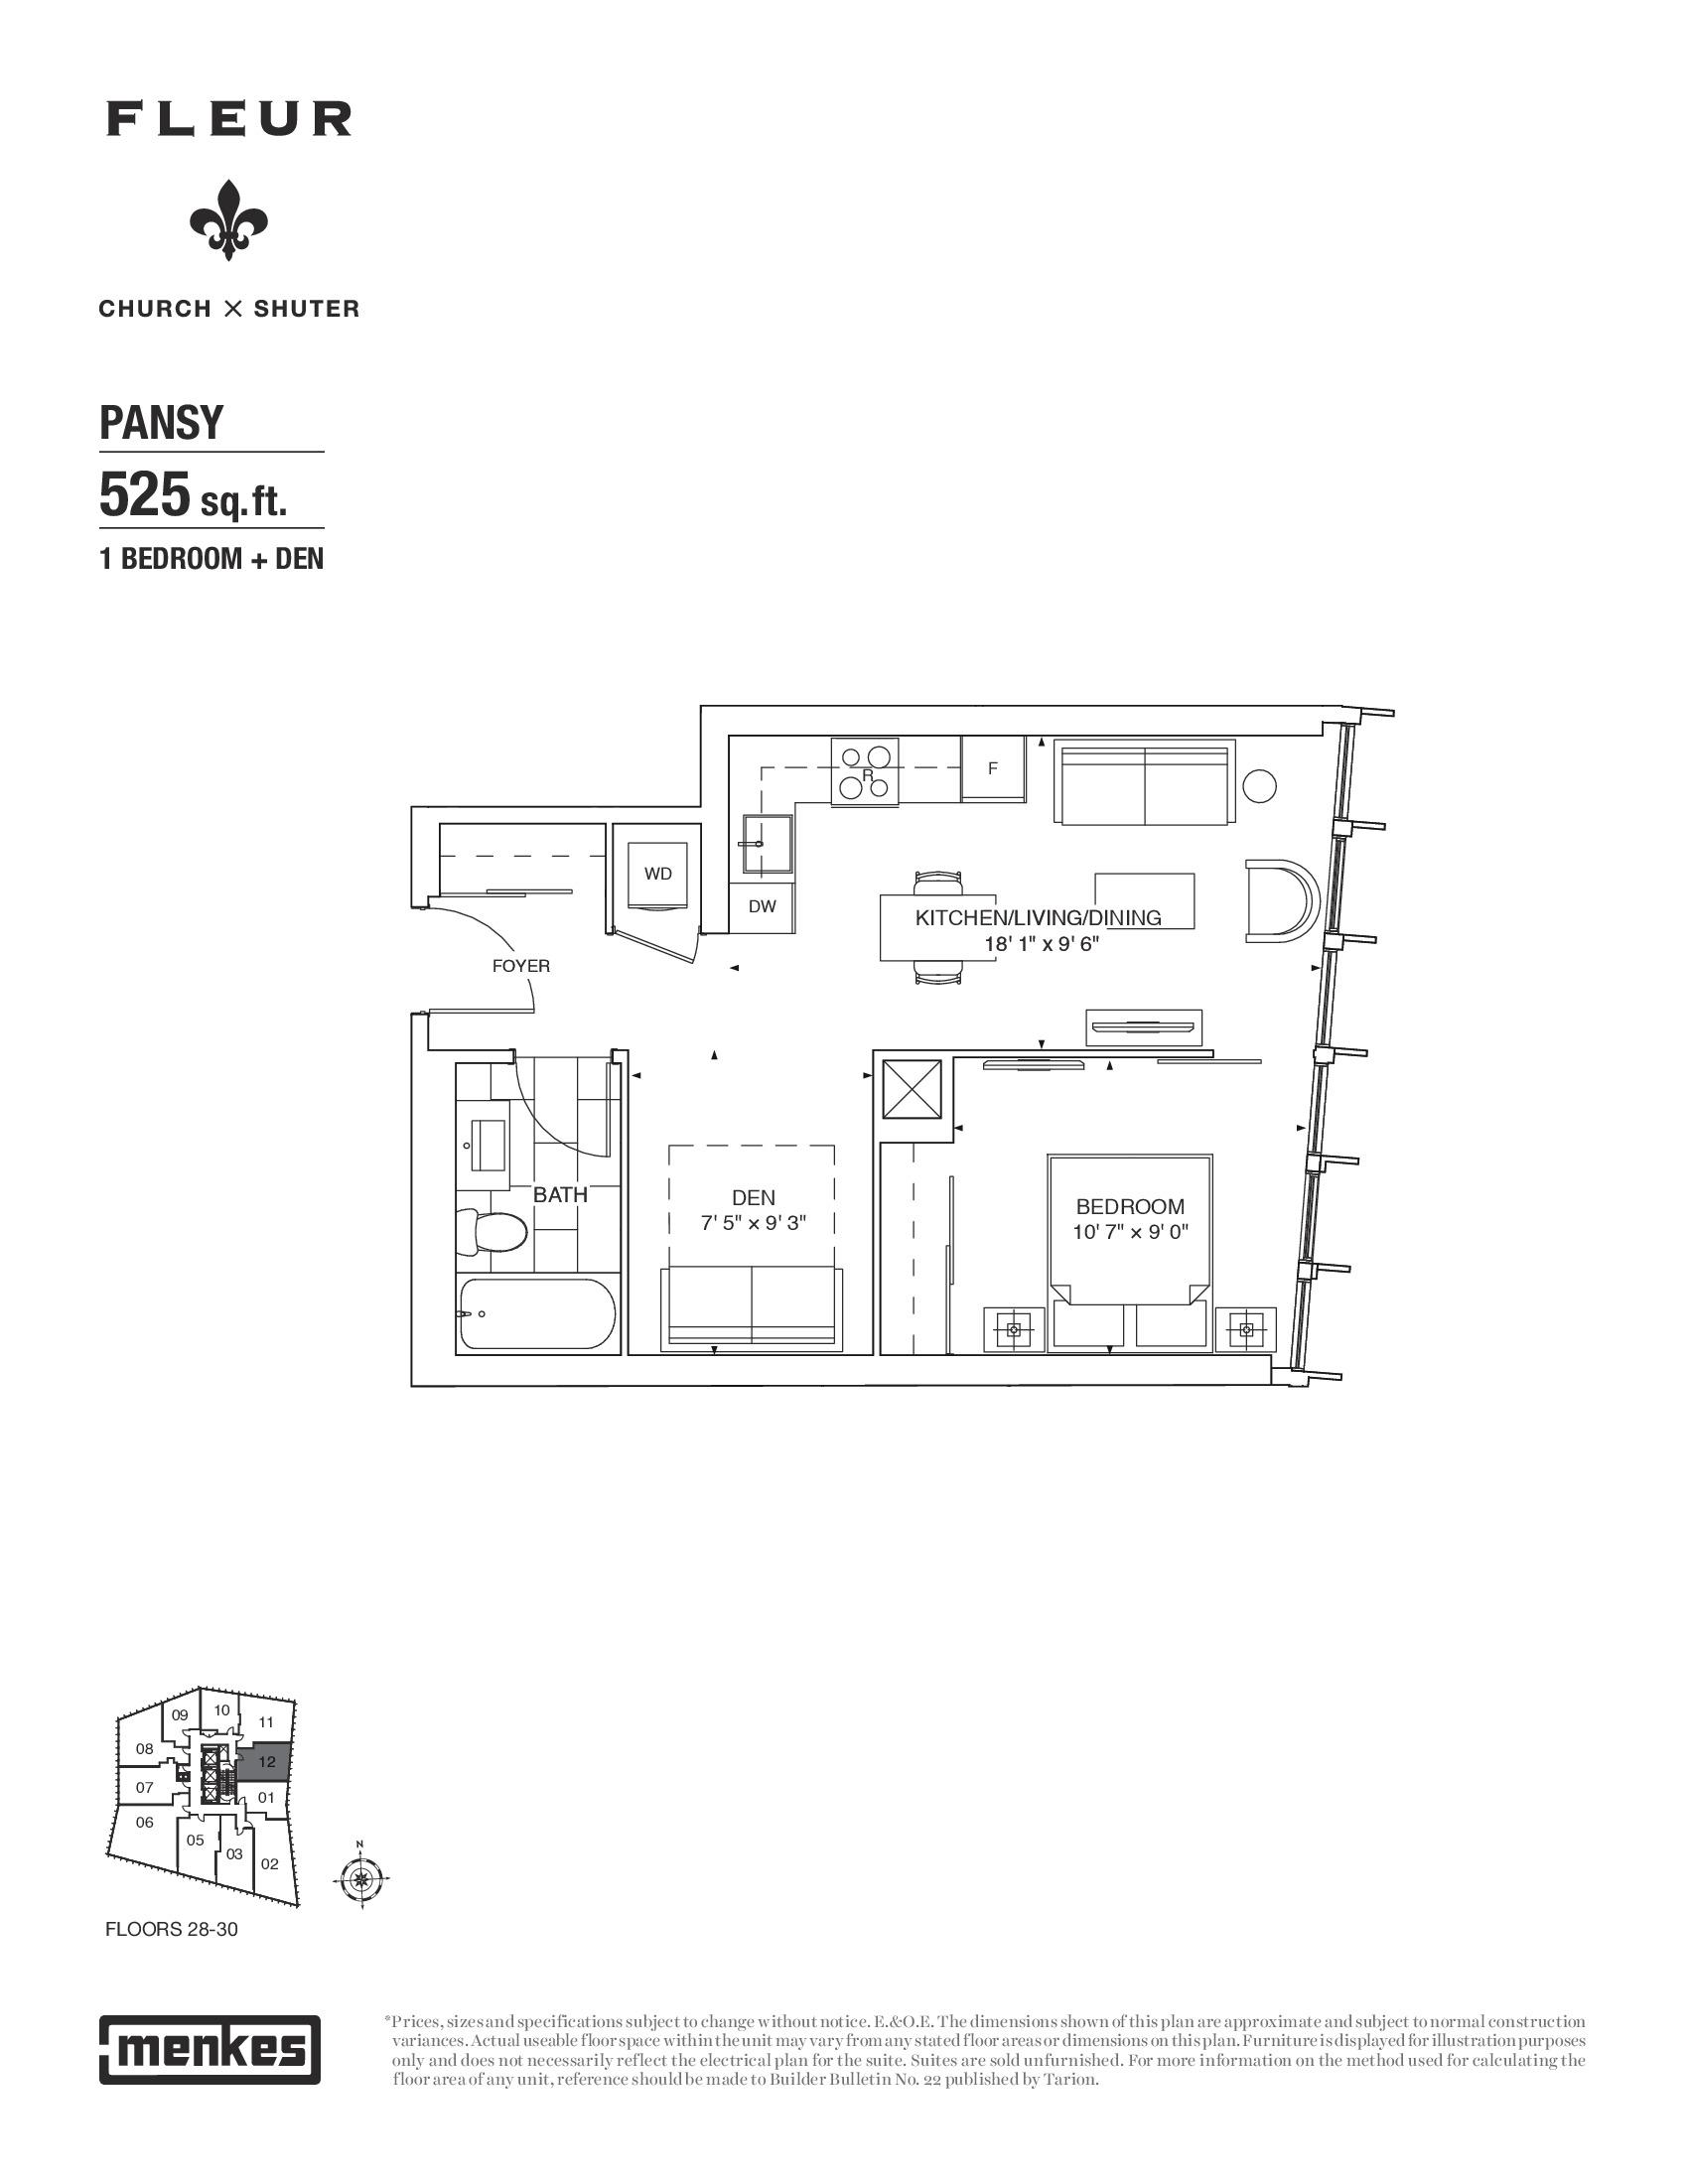 Pansy Floor Plan at Fleur Condos - 525 sq.ft